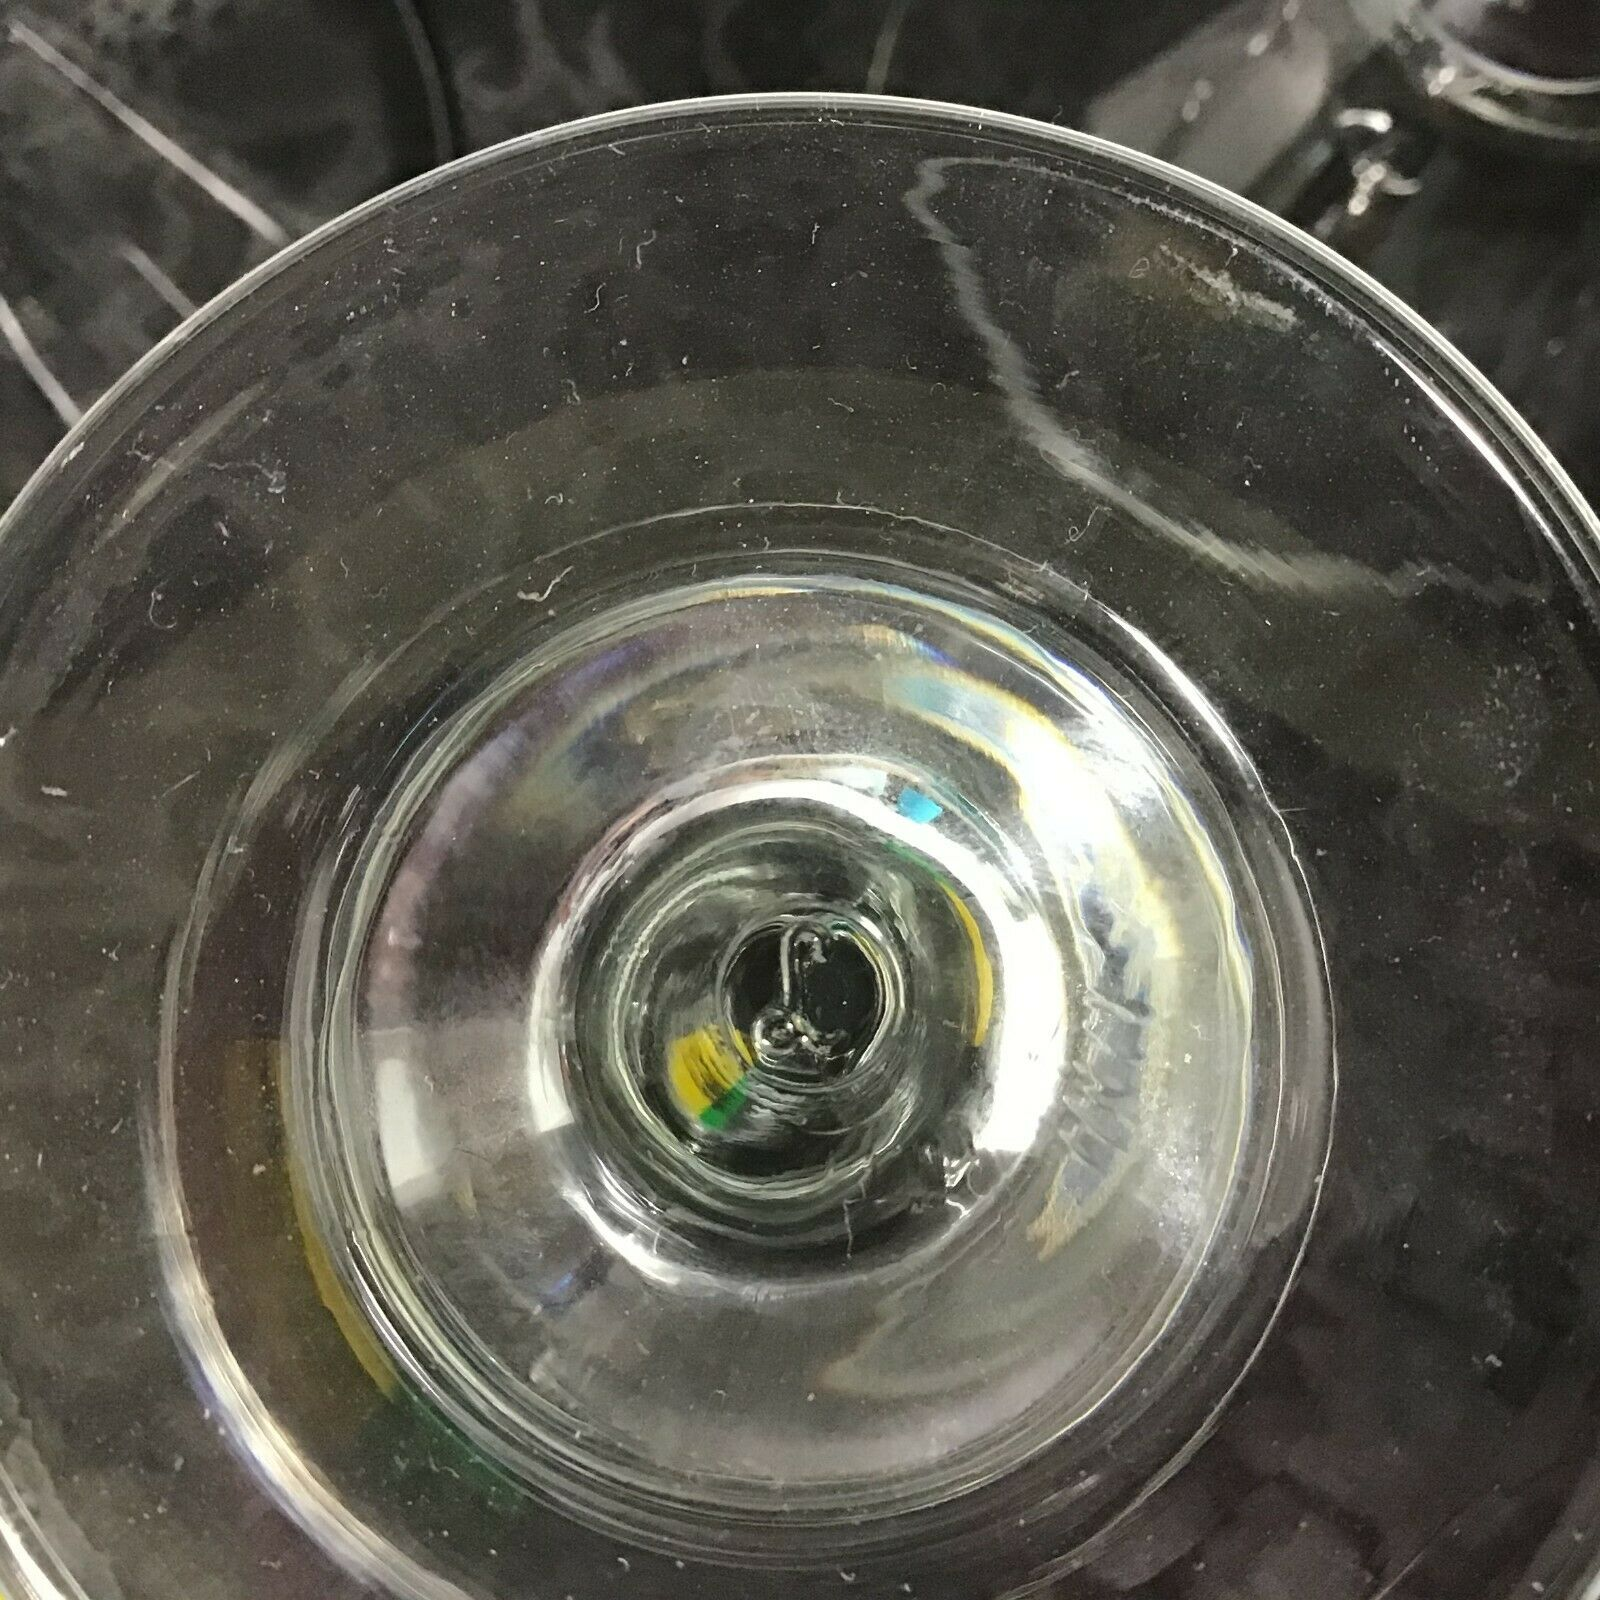 6 Libbey Embassy Plain Cocktail Martini Glasses 7oz 6.4 4oz 5 3 Oz Tasters - $35.99